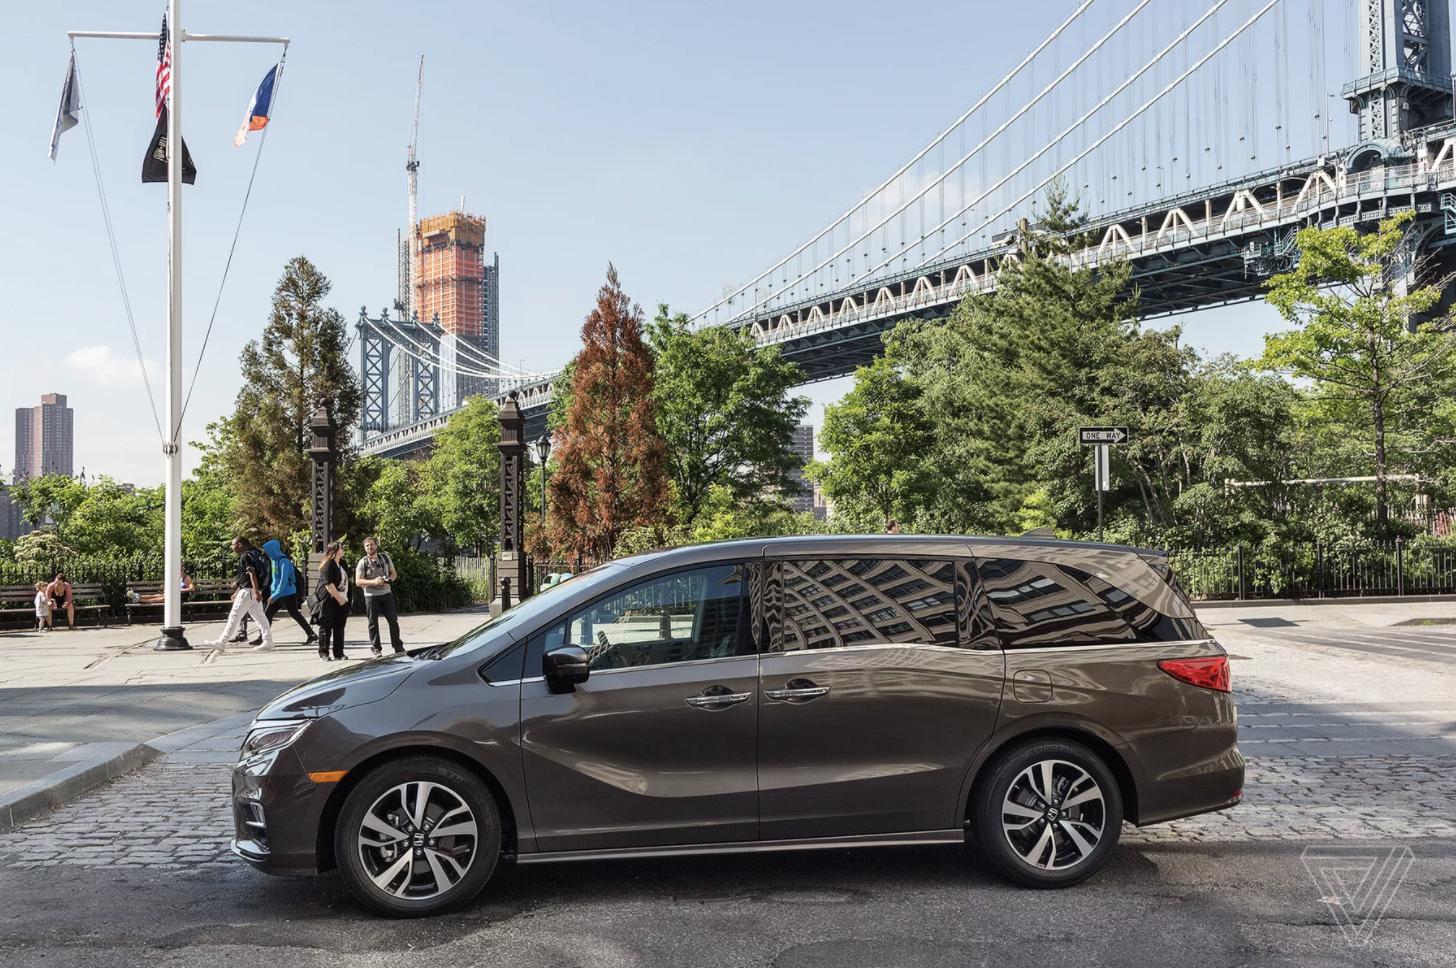 Honda Recalls 608,000 Vehicles For Faulty Software